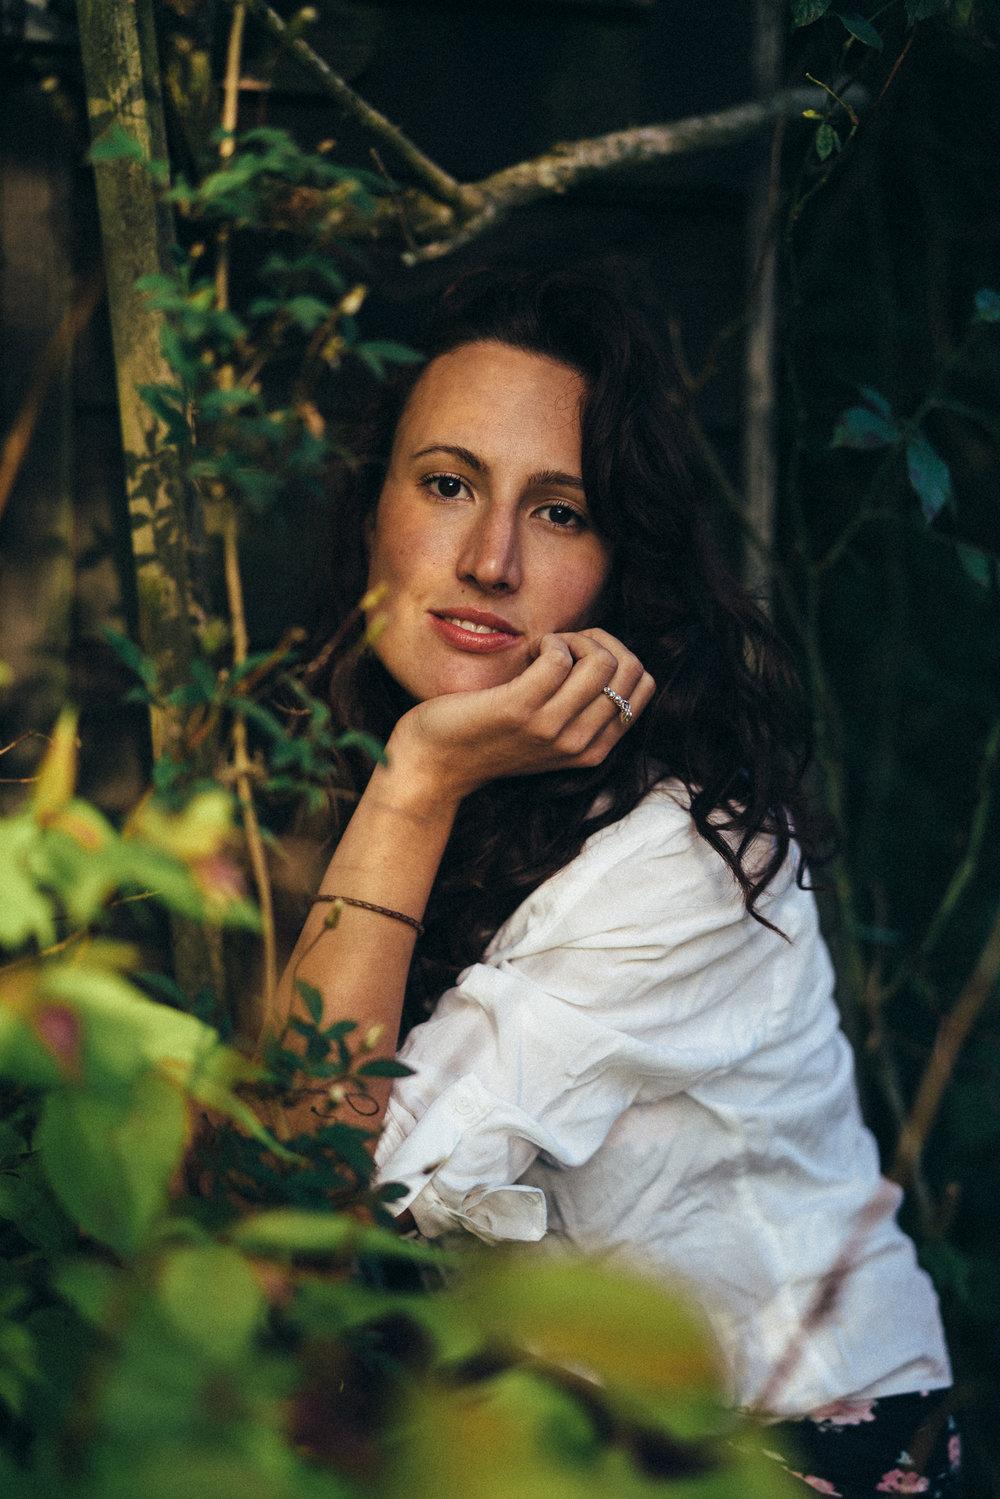 Julie Magnussen Photography San Diego California Brand Lifestyle Portrait Events Retreats and Workshops